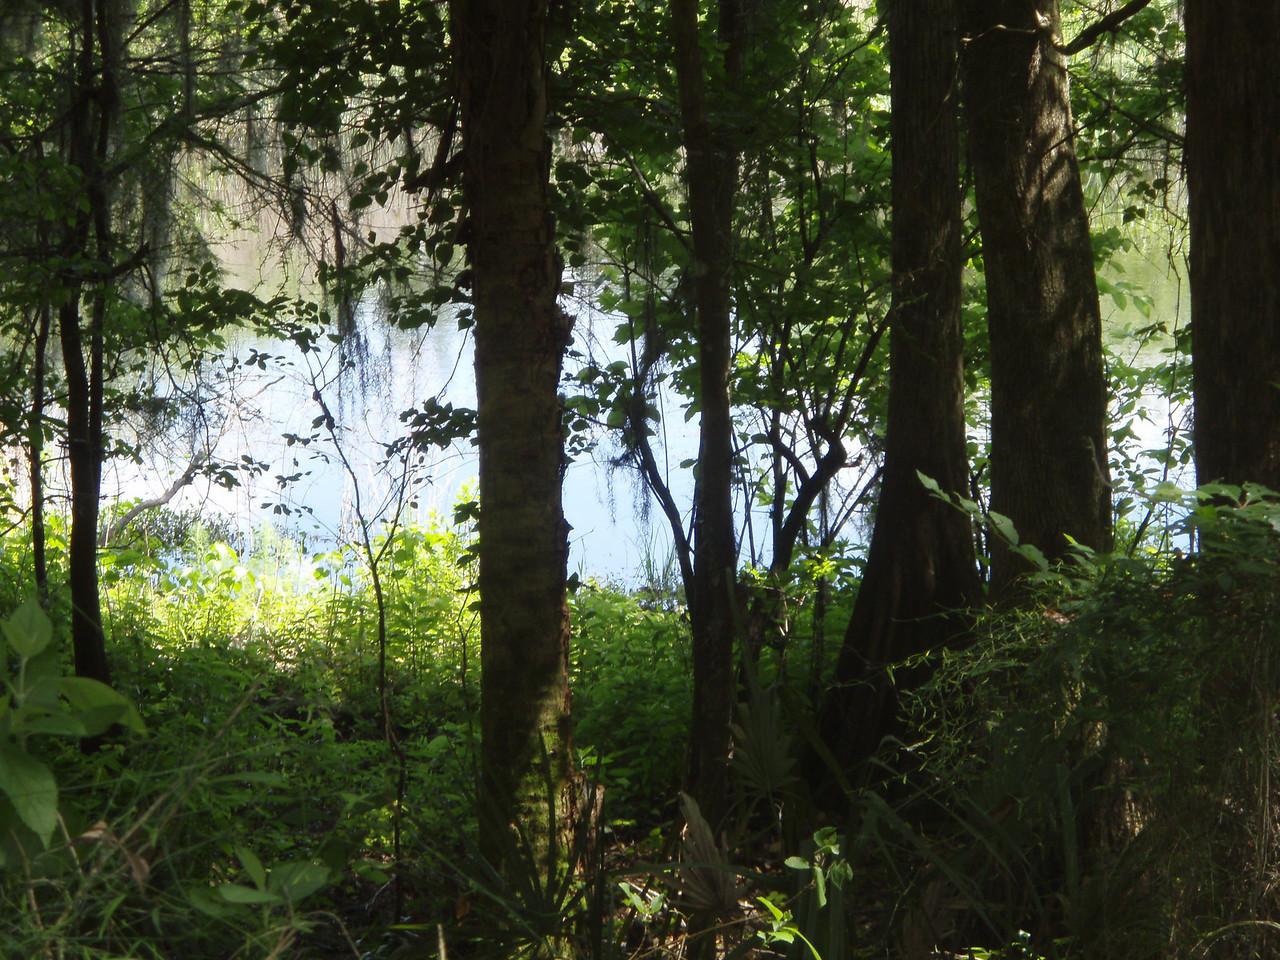 View along the trail in Potts Preserve<br /> Potts Preserve Trail